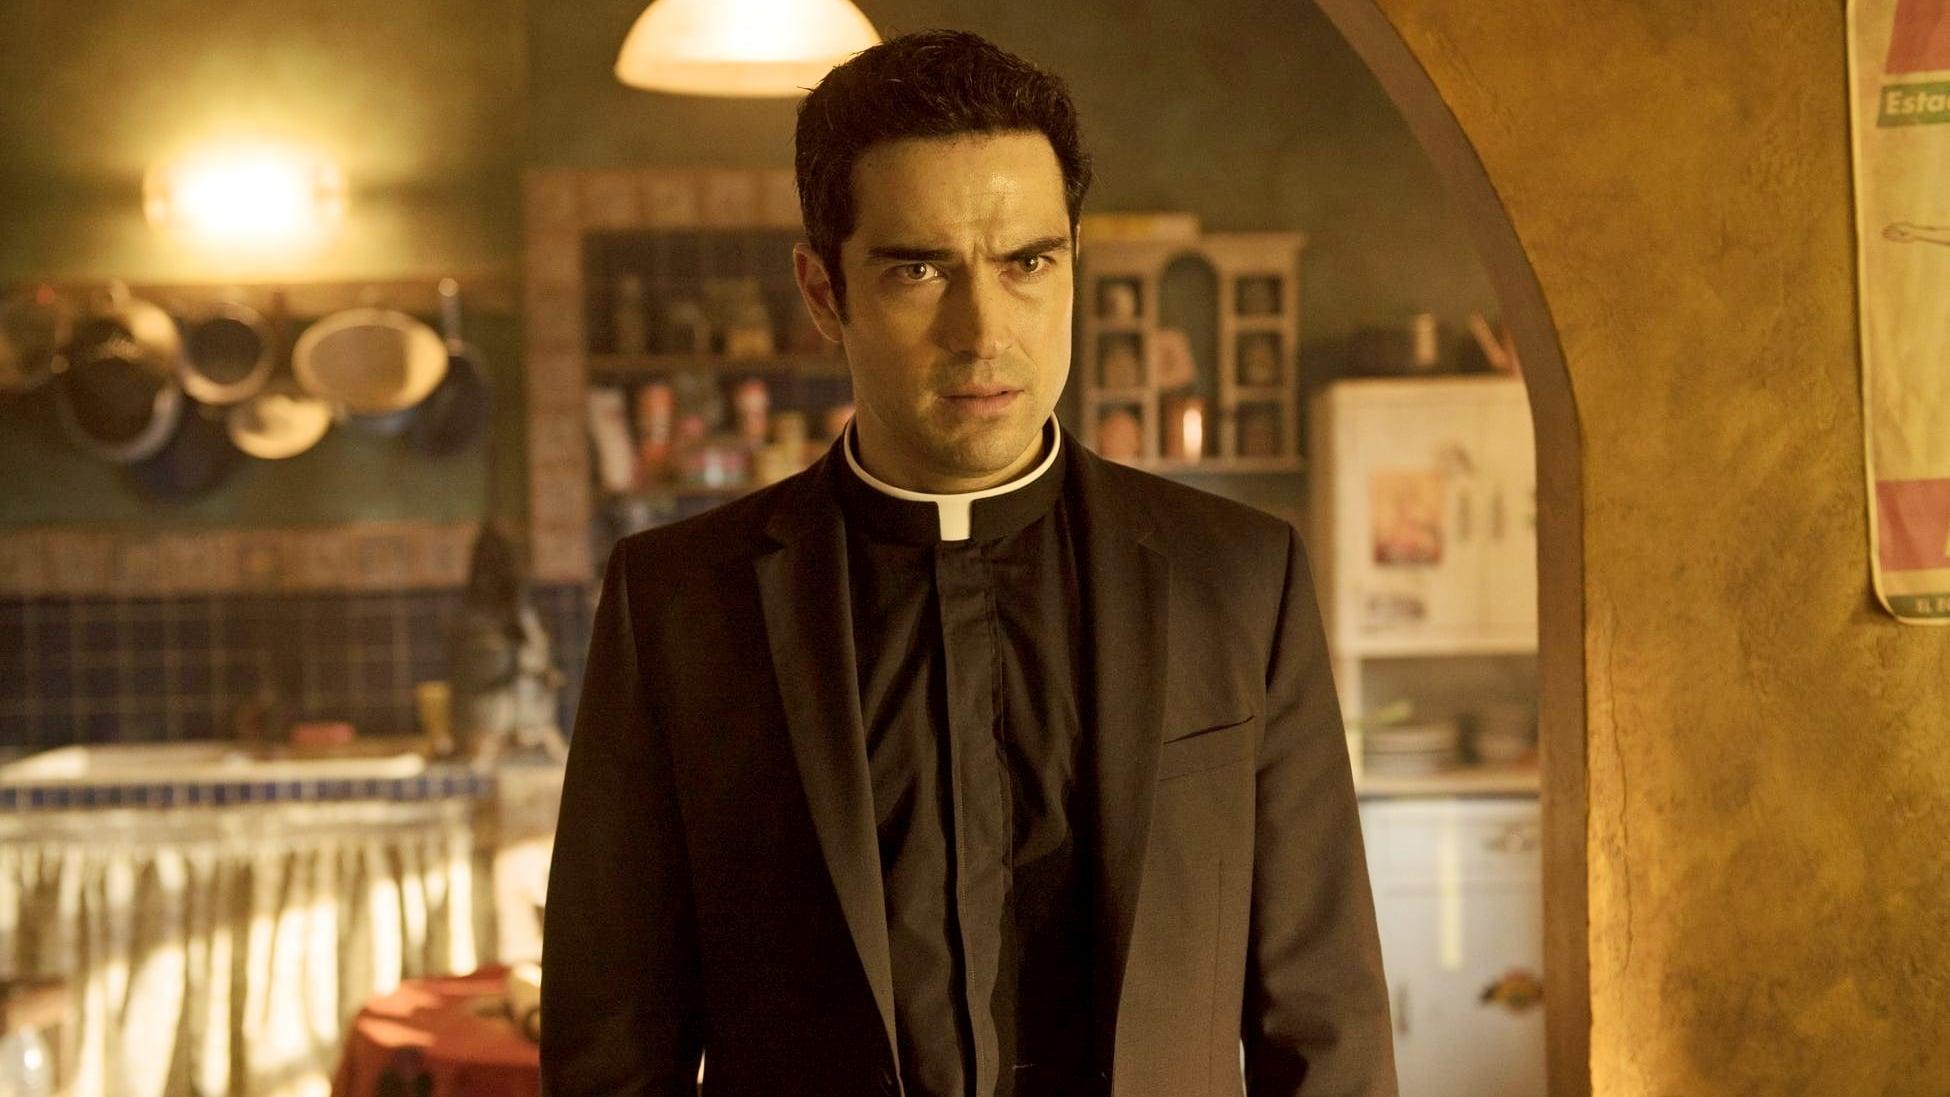 The Exorcist: Temporada 1, Capitulo 10